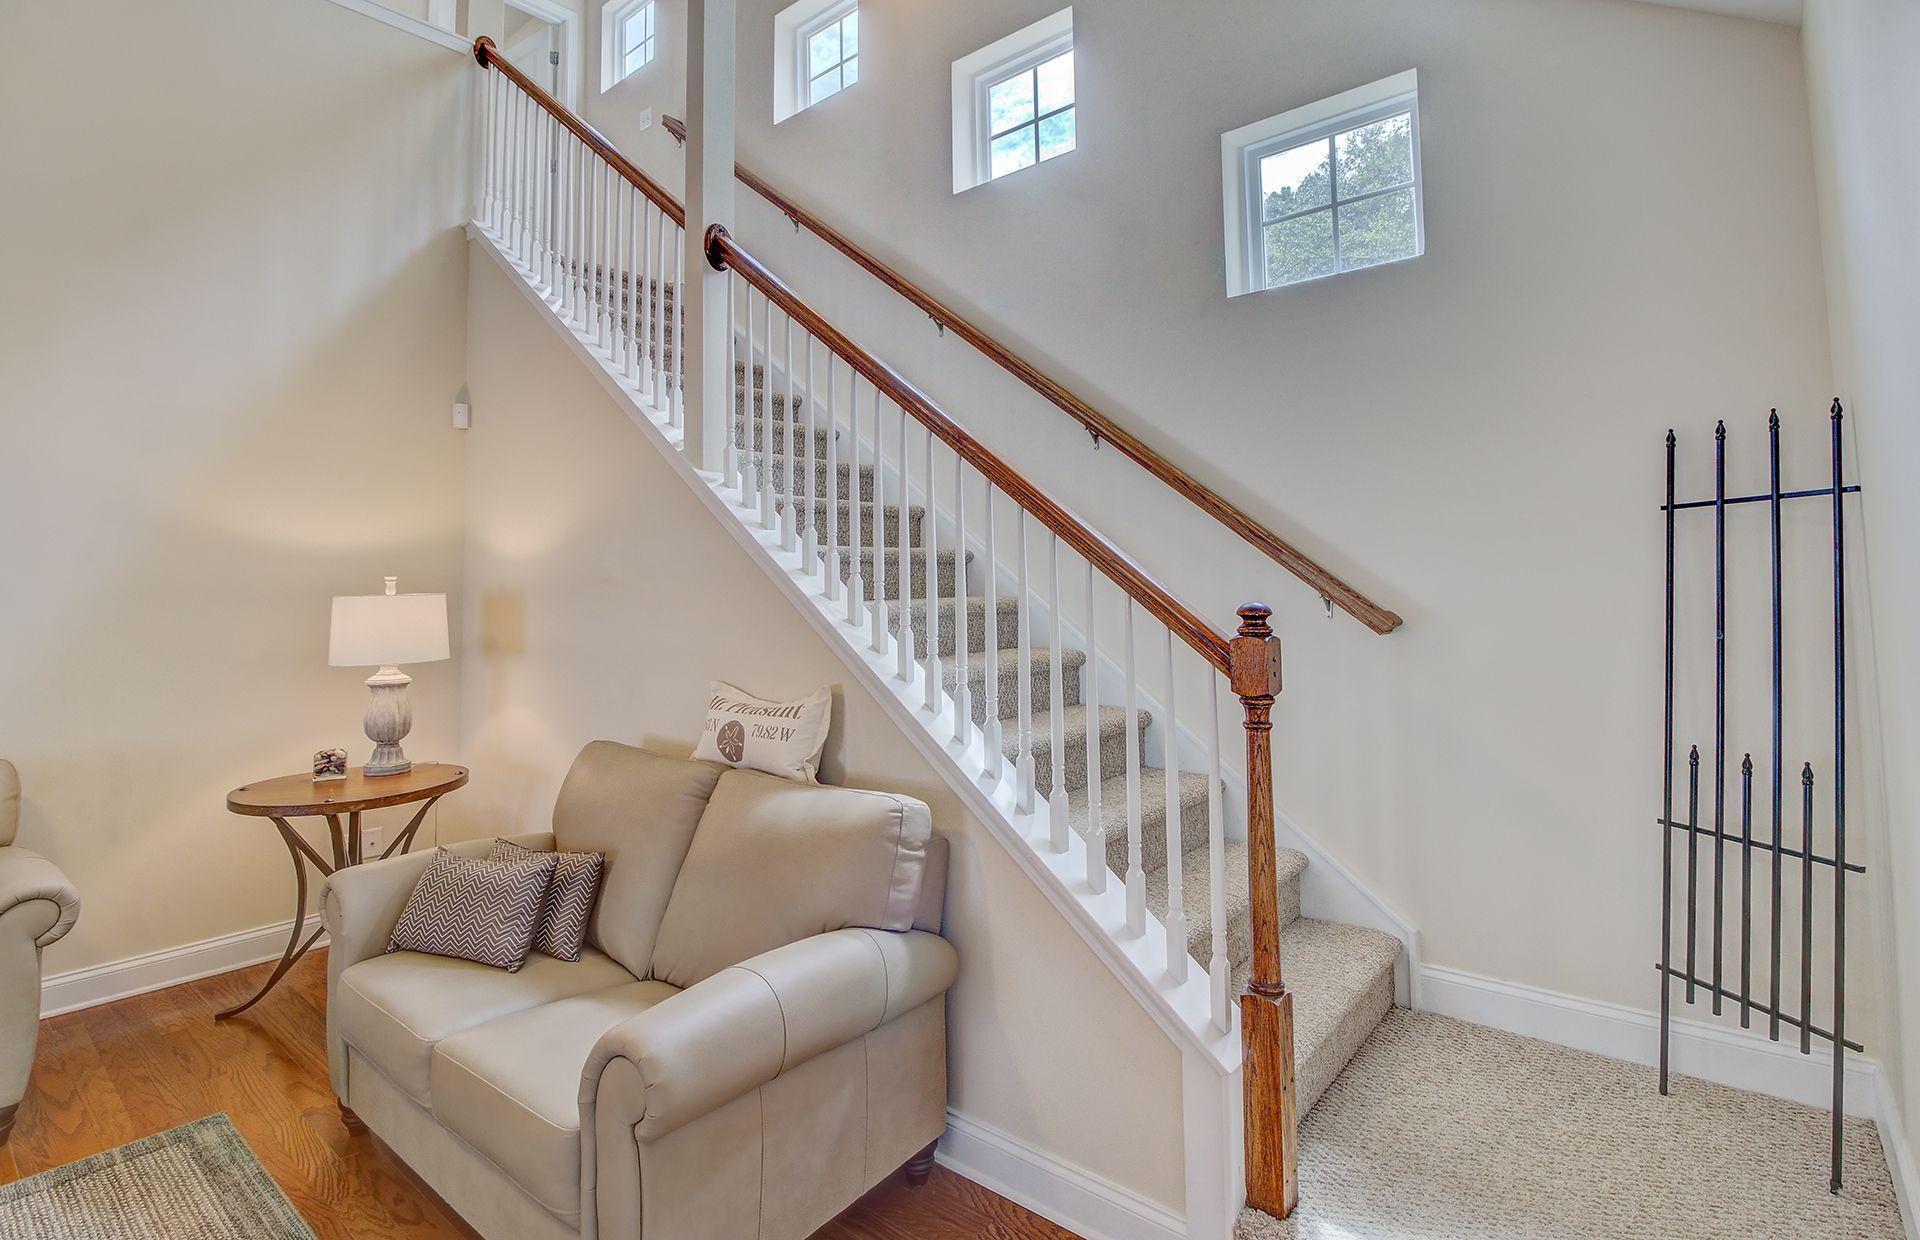 Linnen Place Homes For Sale - 1275 Shingleback, Mount Pleasant, SC - 16